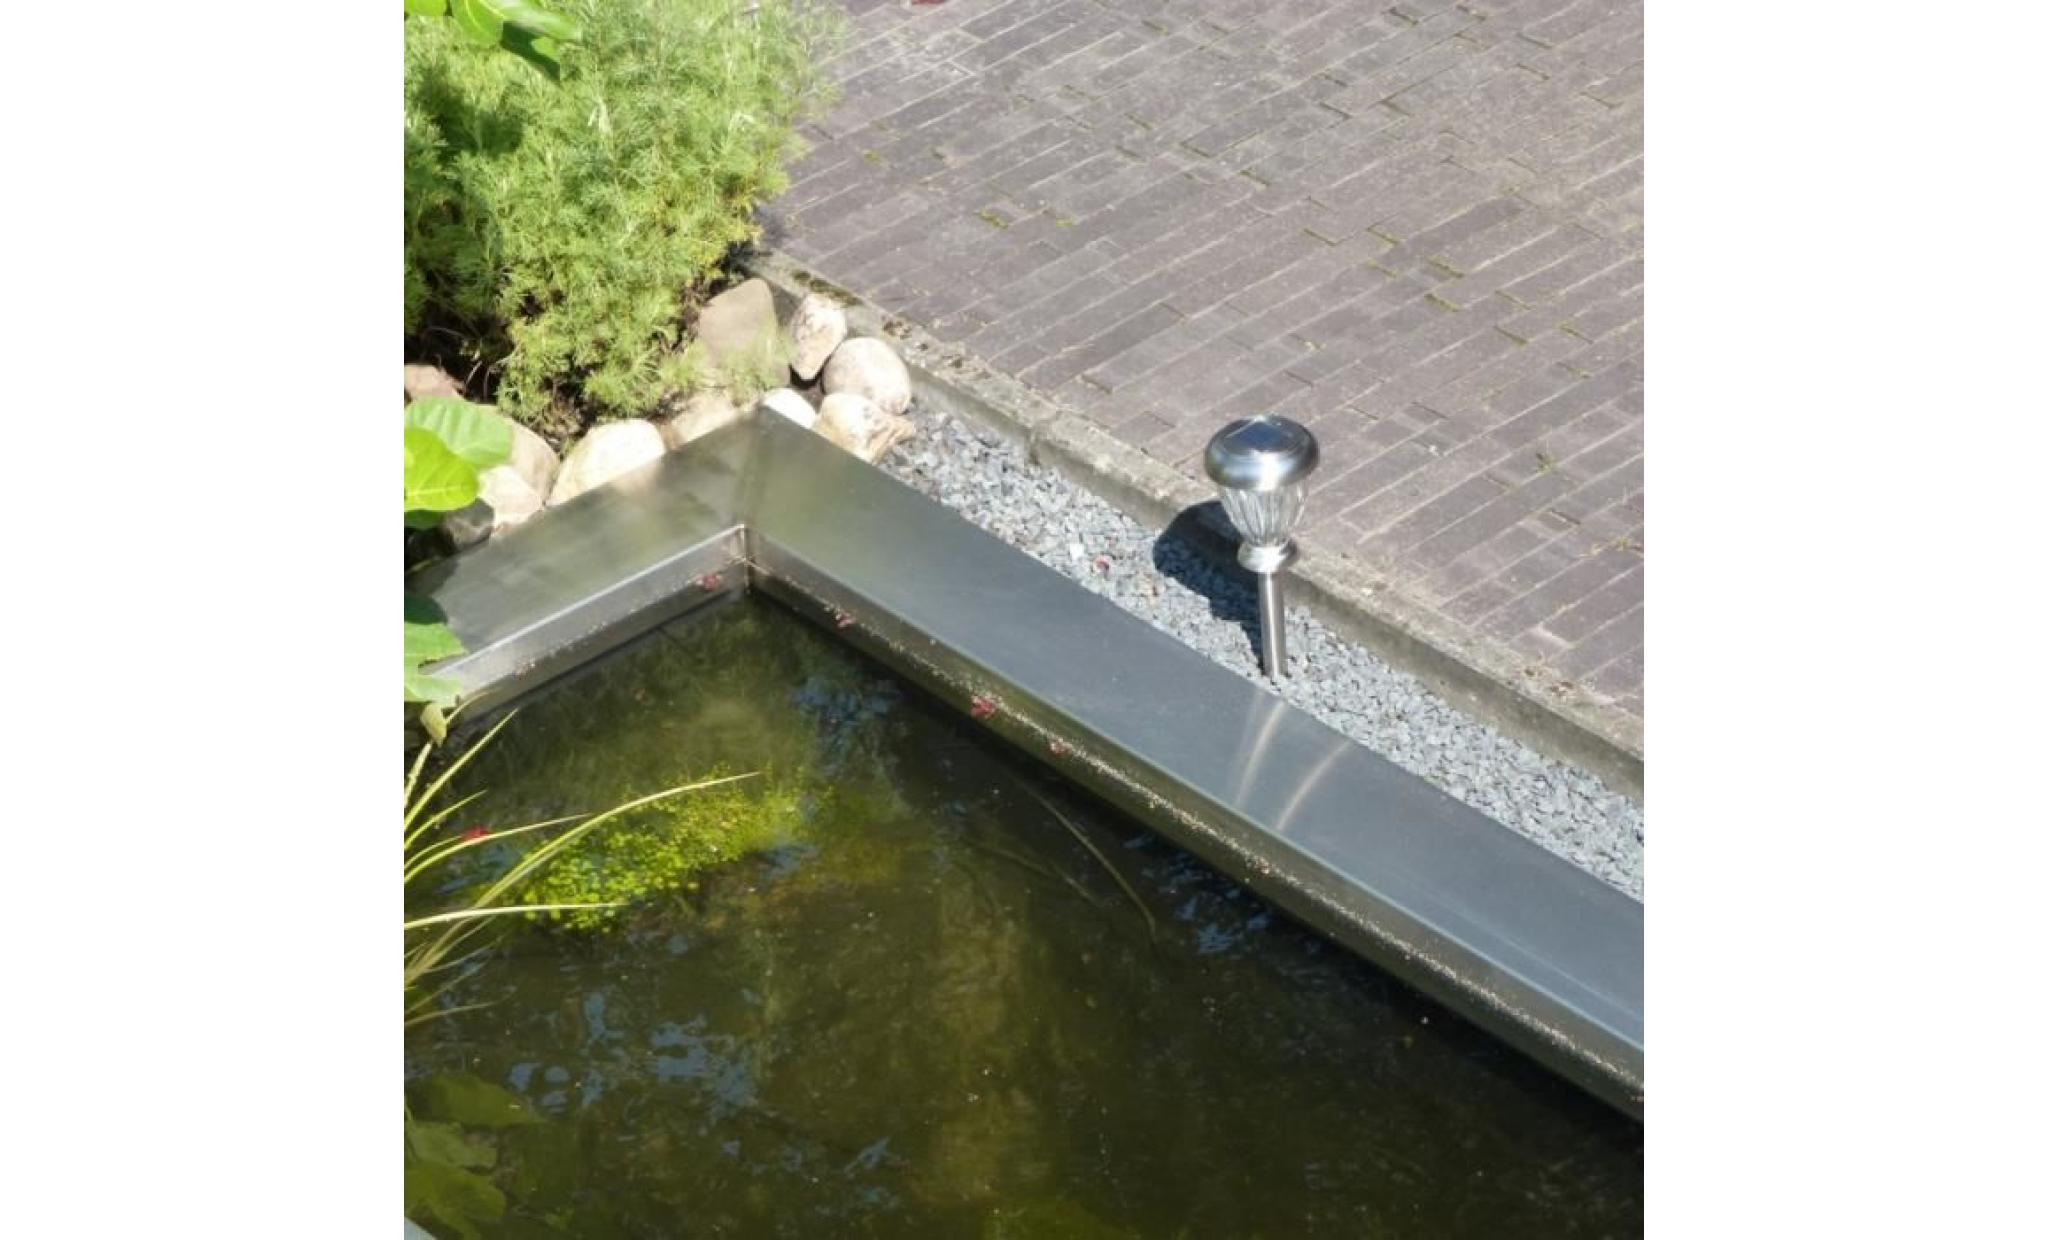 magnifique lampe de jardin solaire hautement lumineuse luxbright perpignan achat vente lampe. Black Bedroom Furniture Sets. Home Design Ideas